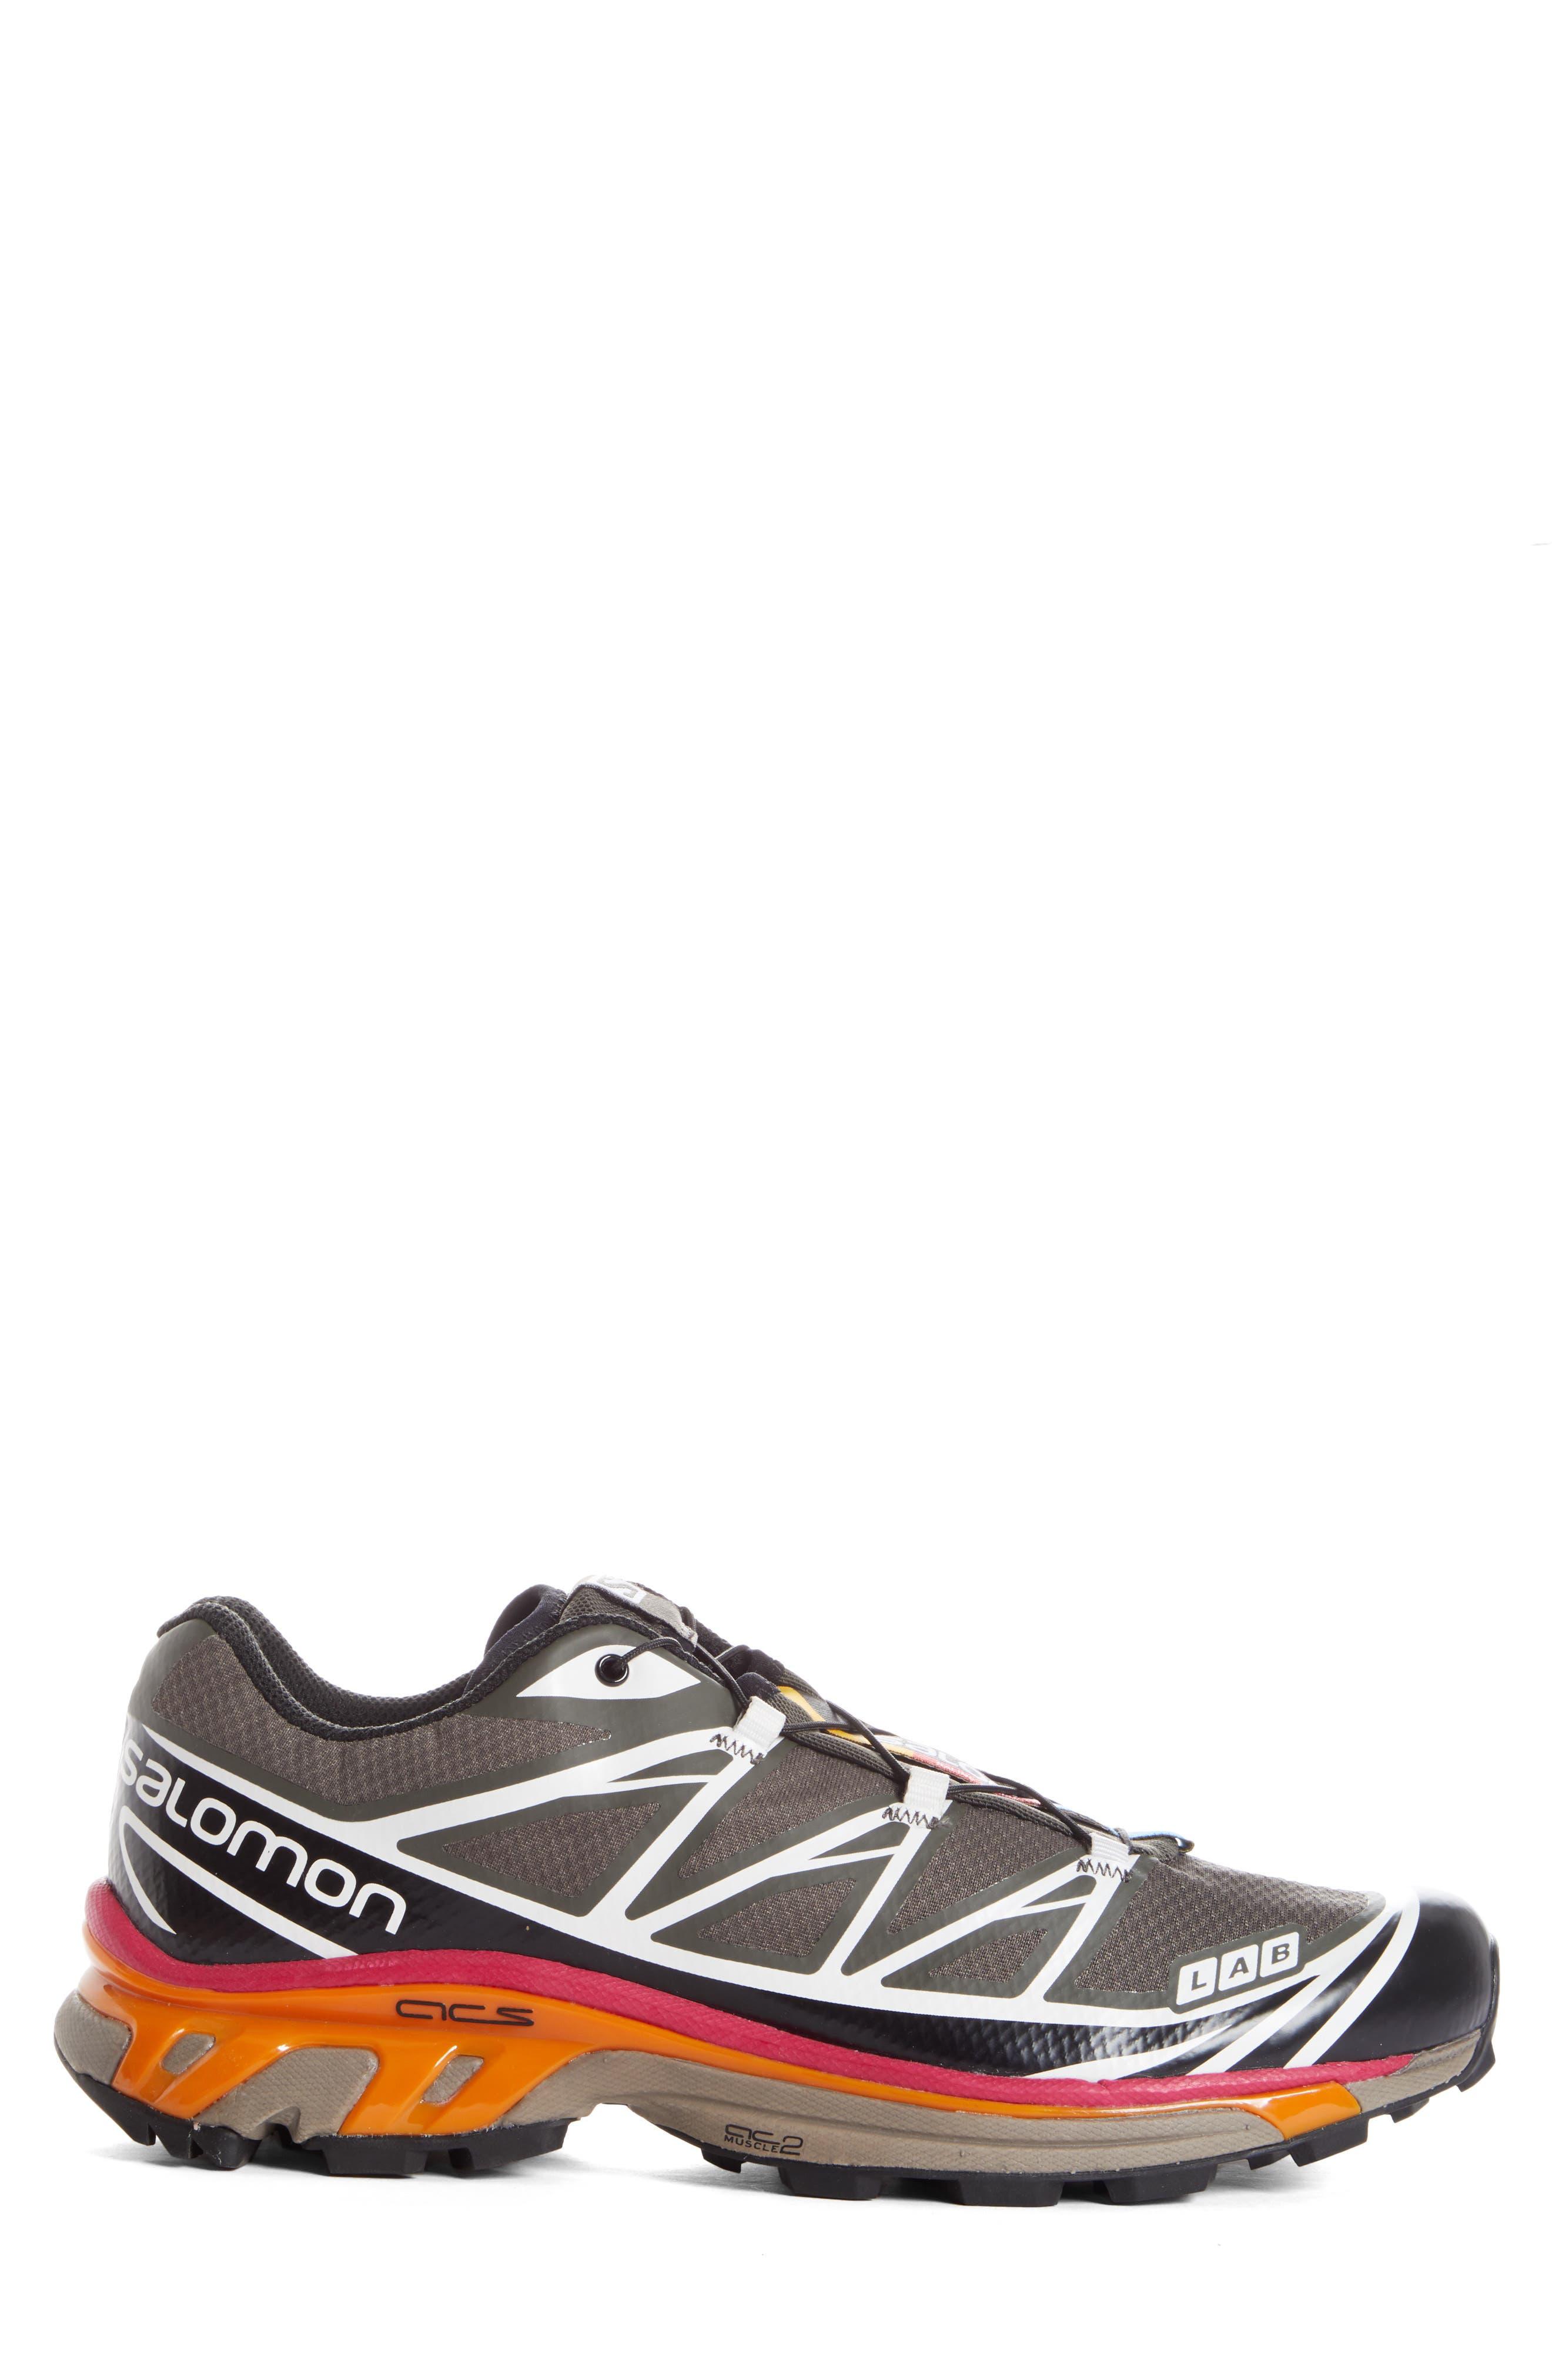 7dab8b26044b Salomon S lab Xt-6 Softground Adv Ltd Trail Running Shoe